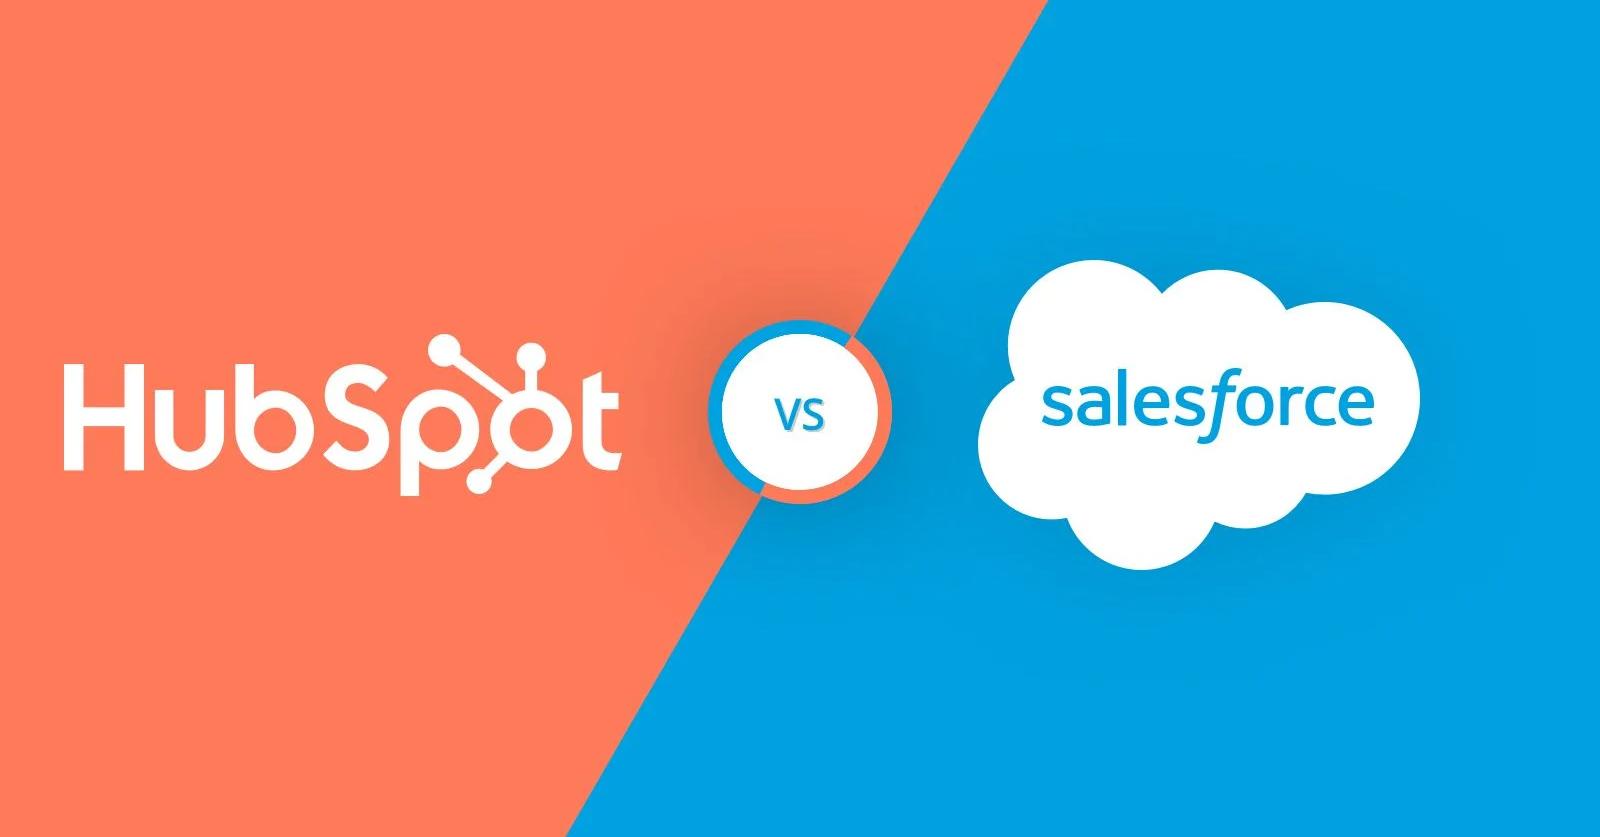 Software Showdown: HubSpot vs. Salesforce